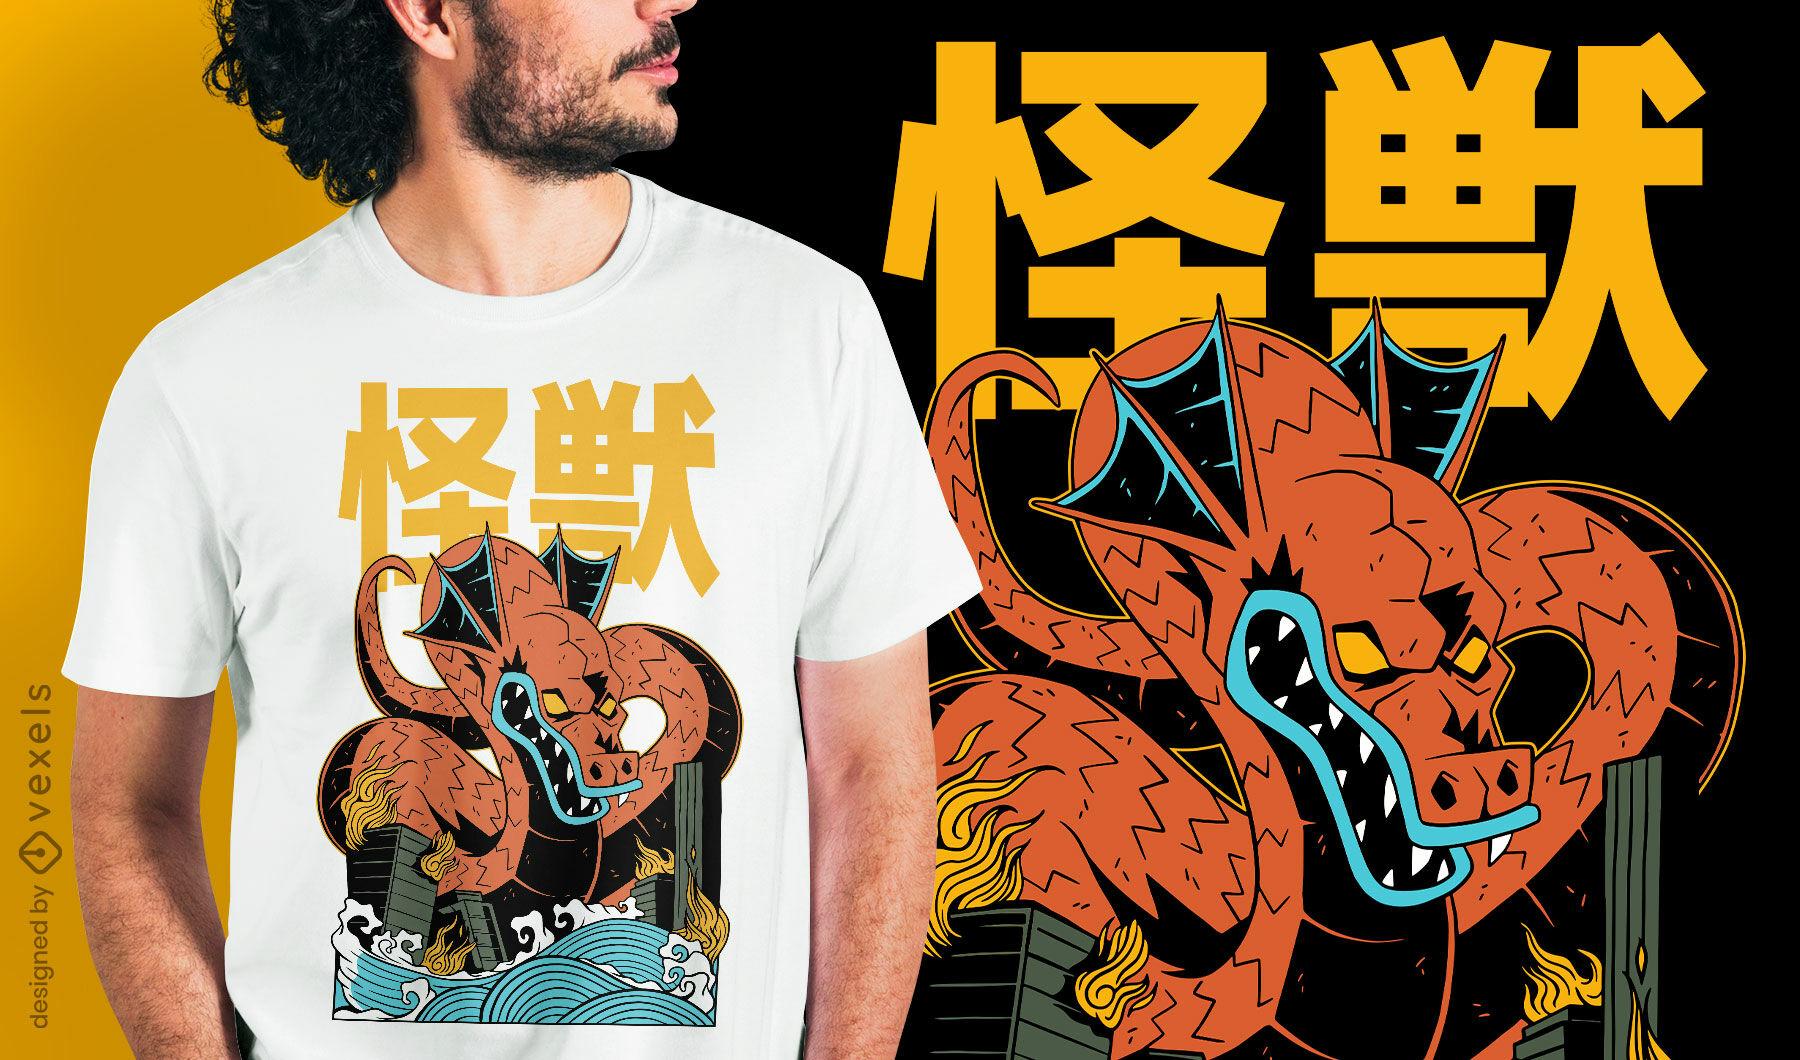 Dragon kaiju Japanese creature t-shirt design